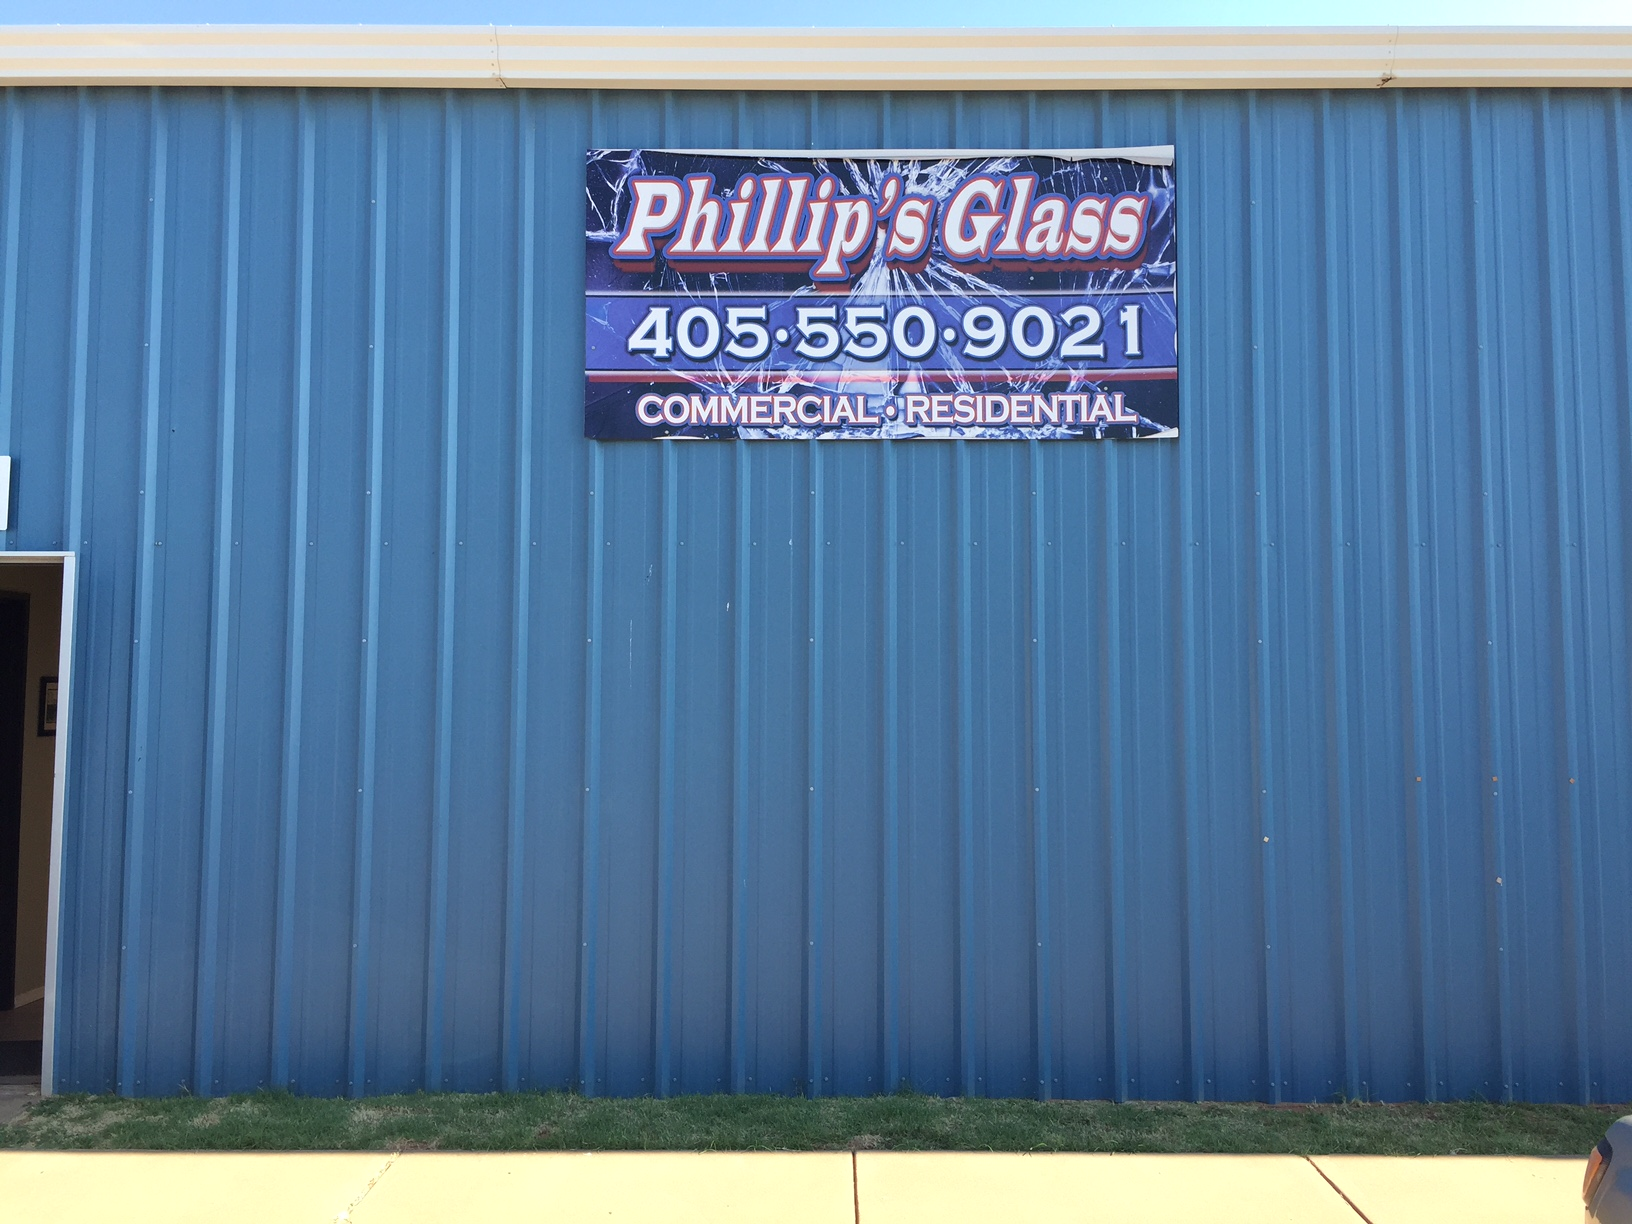 Phillips Glass image 3